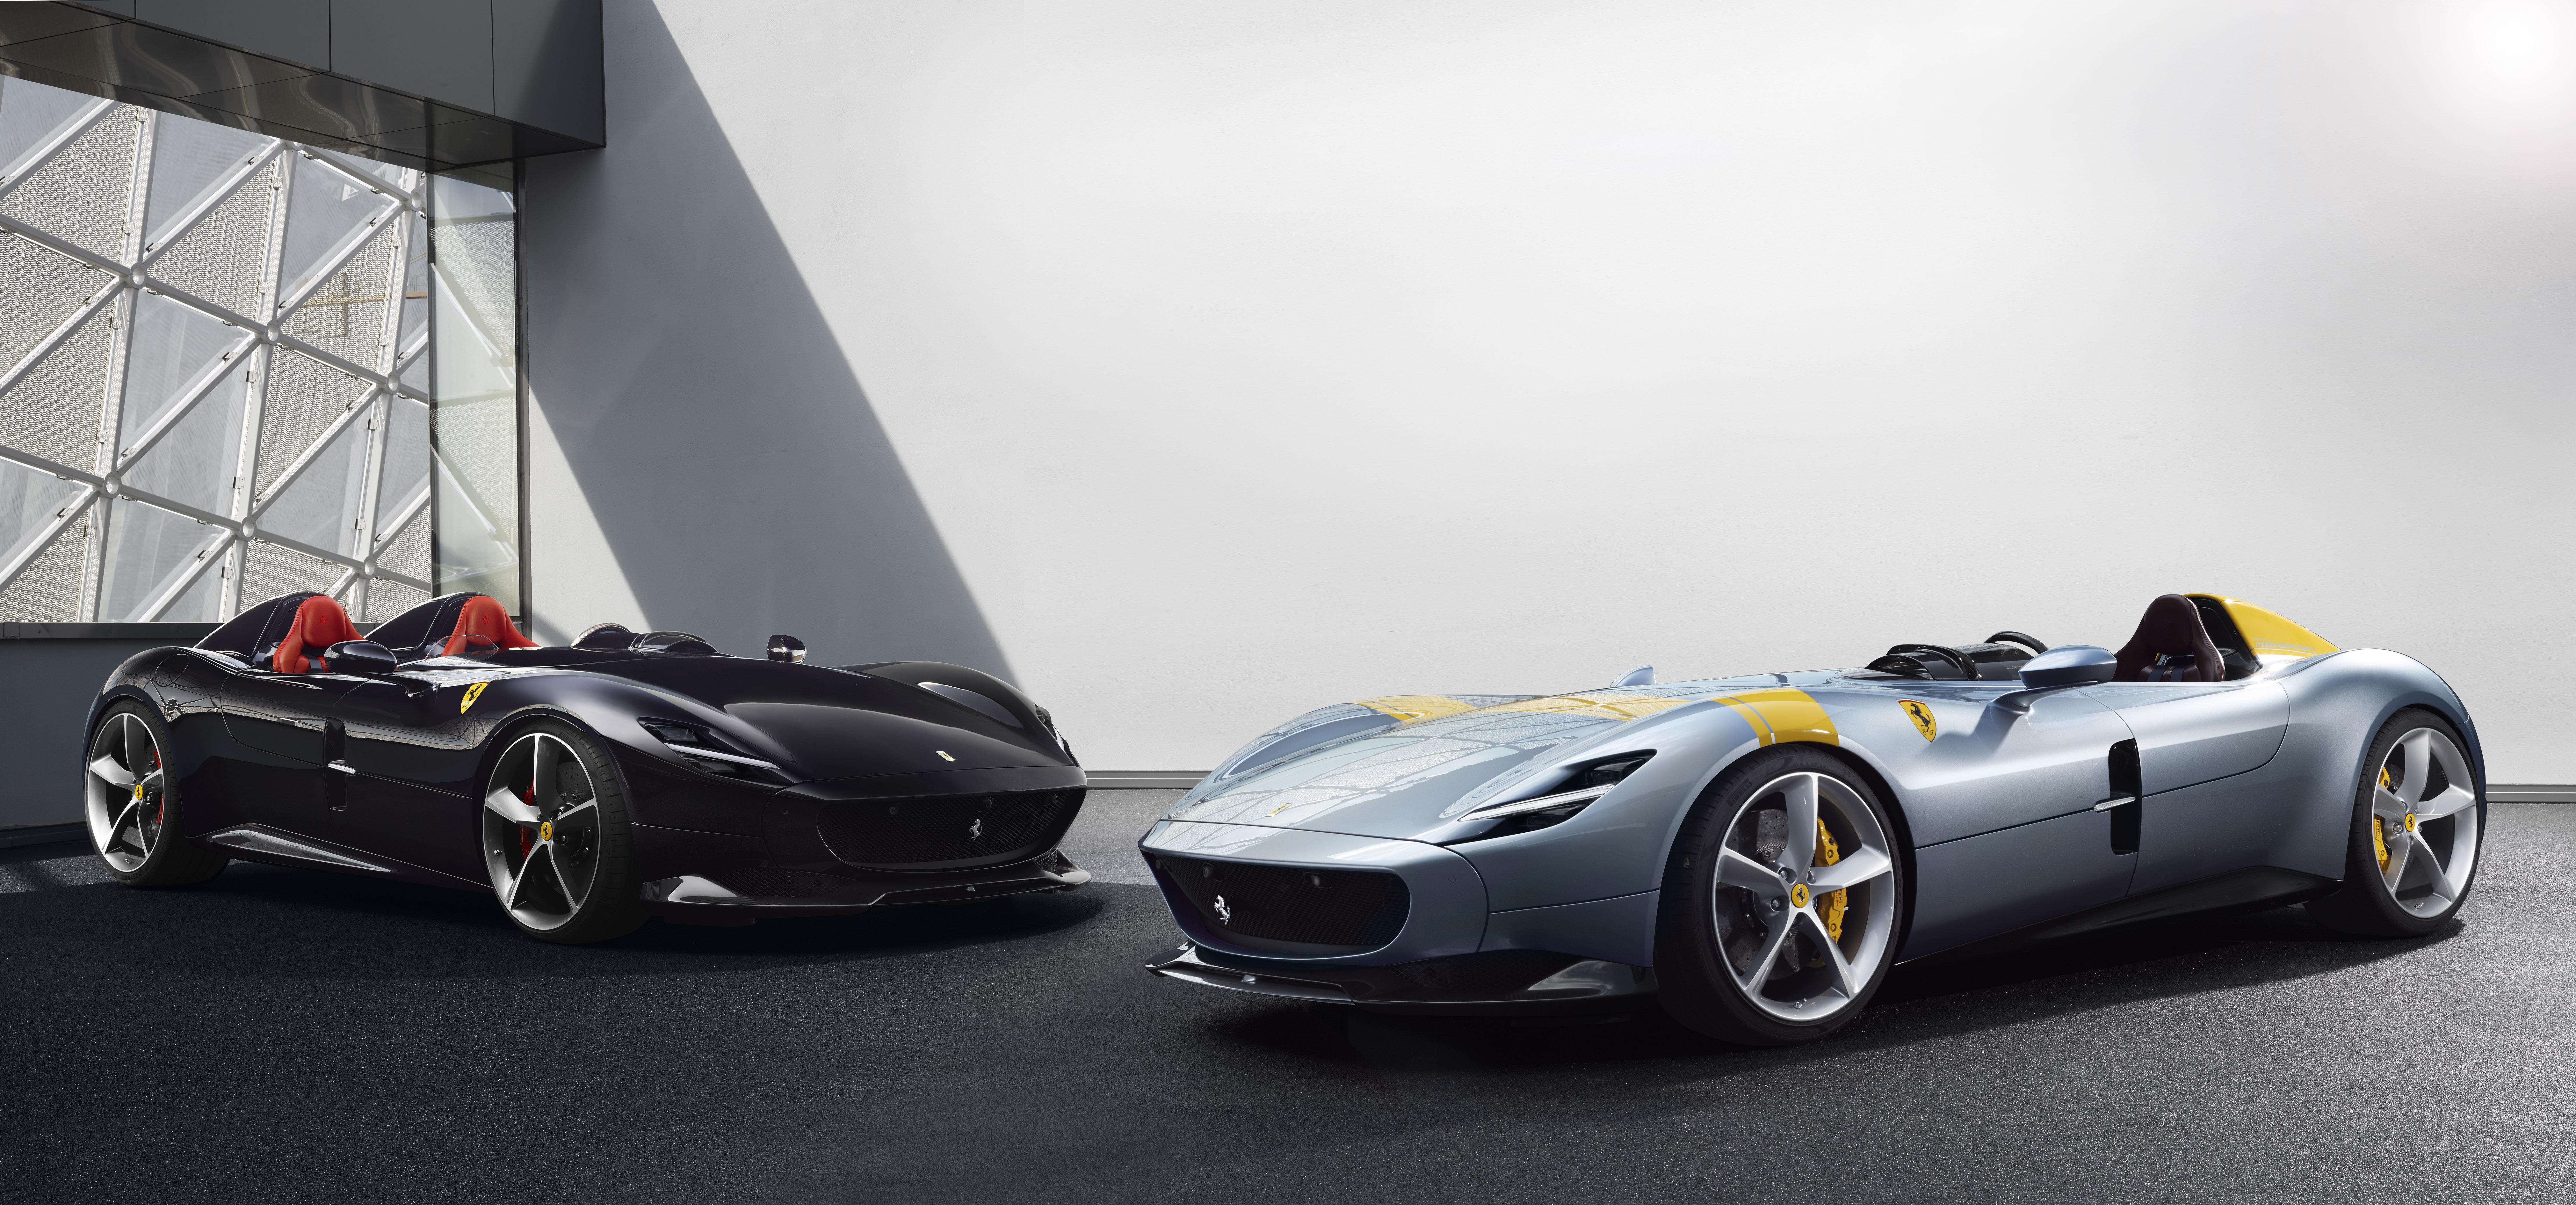 Ferrari Monza SP1 and SP2.